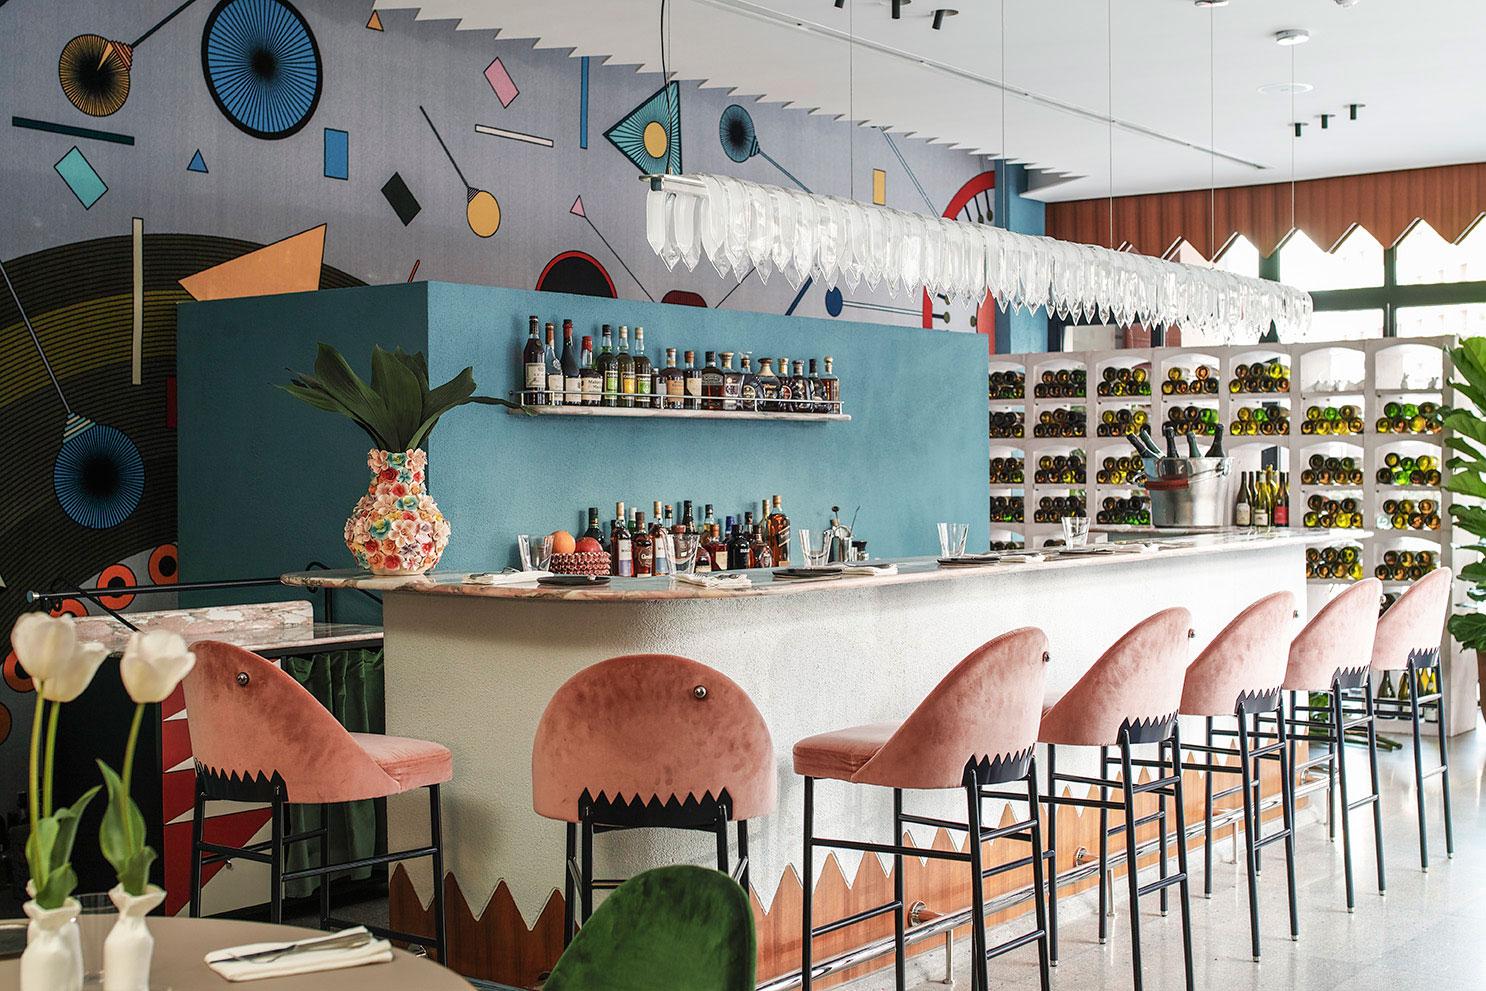 Kaléo fine dining restaurant in beirut by david nicolas